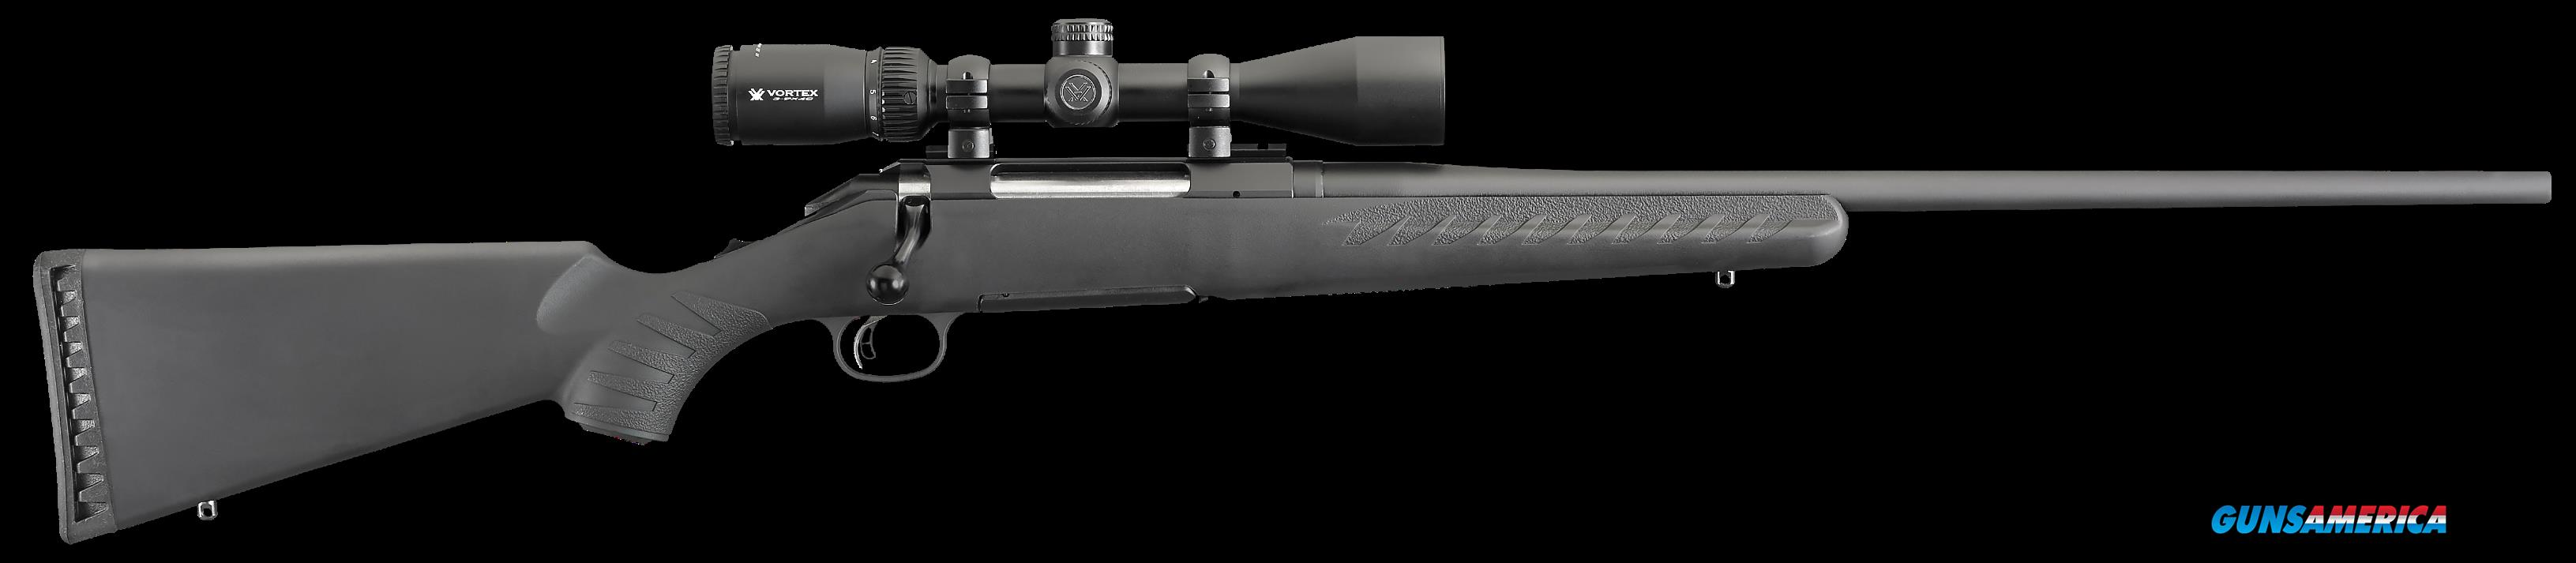 Ruger American, Rug 16932 American  270  Vortex Scp  Blk Syn  Guns > Pistols > 1911 Pistol Copies (non-Colt)